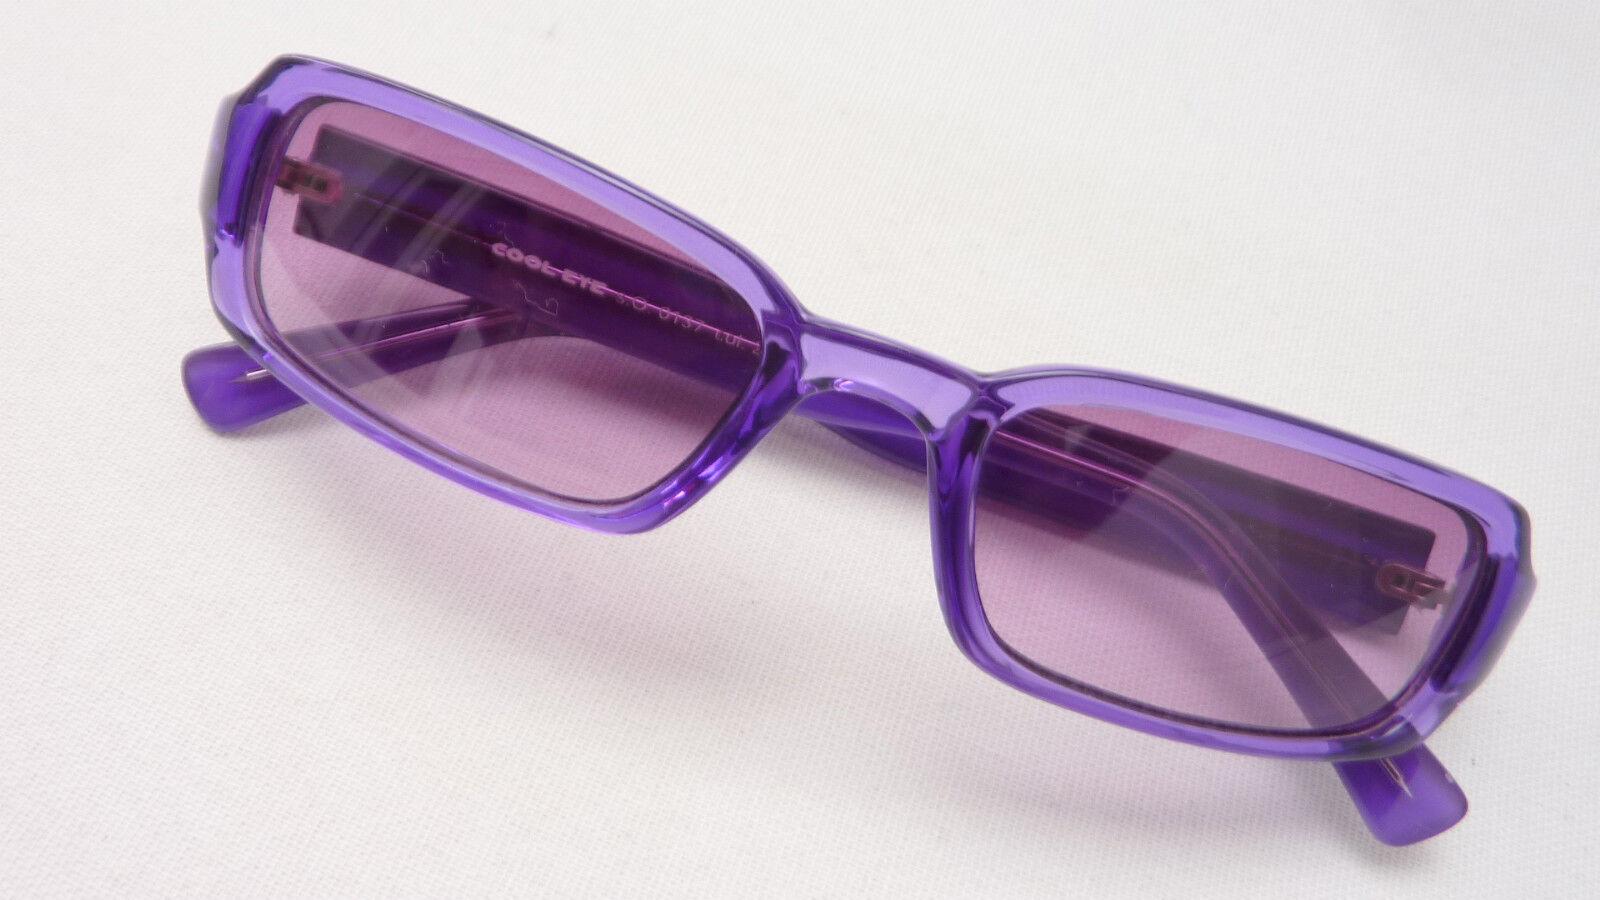 S.Oliver Sonnenbrille Sonnenbrille Sonnenbrille Kunststoff lila Kunststoffgläser 75% grau neu Größe M | eine große Vielfalt  4f9235